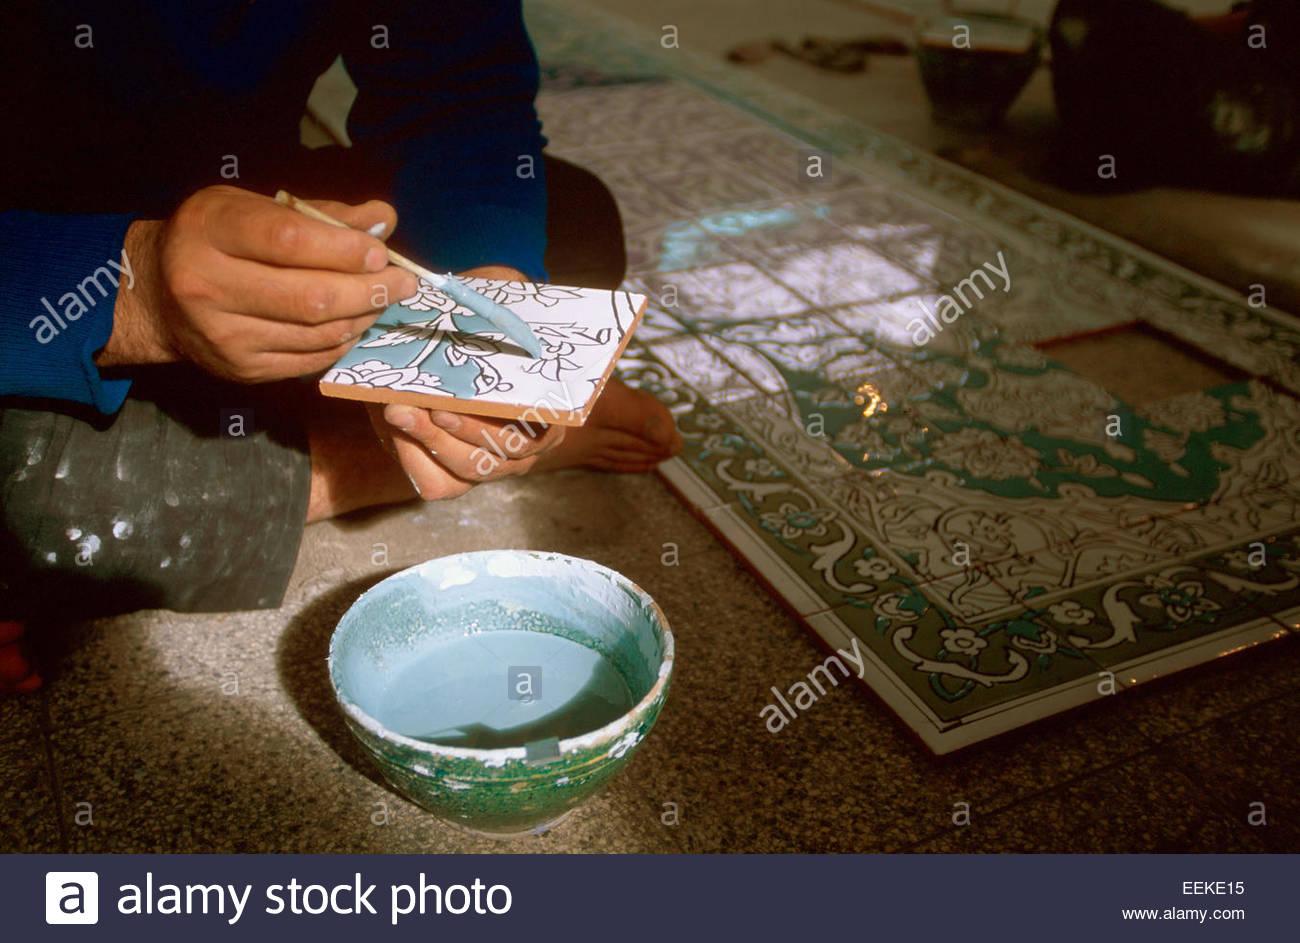 Iran, Ispahan, ceramic and earthenware workshop. Man painting on ceramics - Stock Image